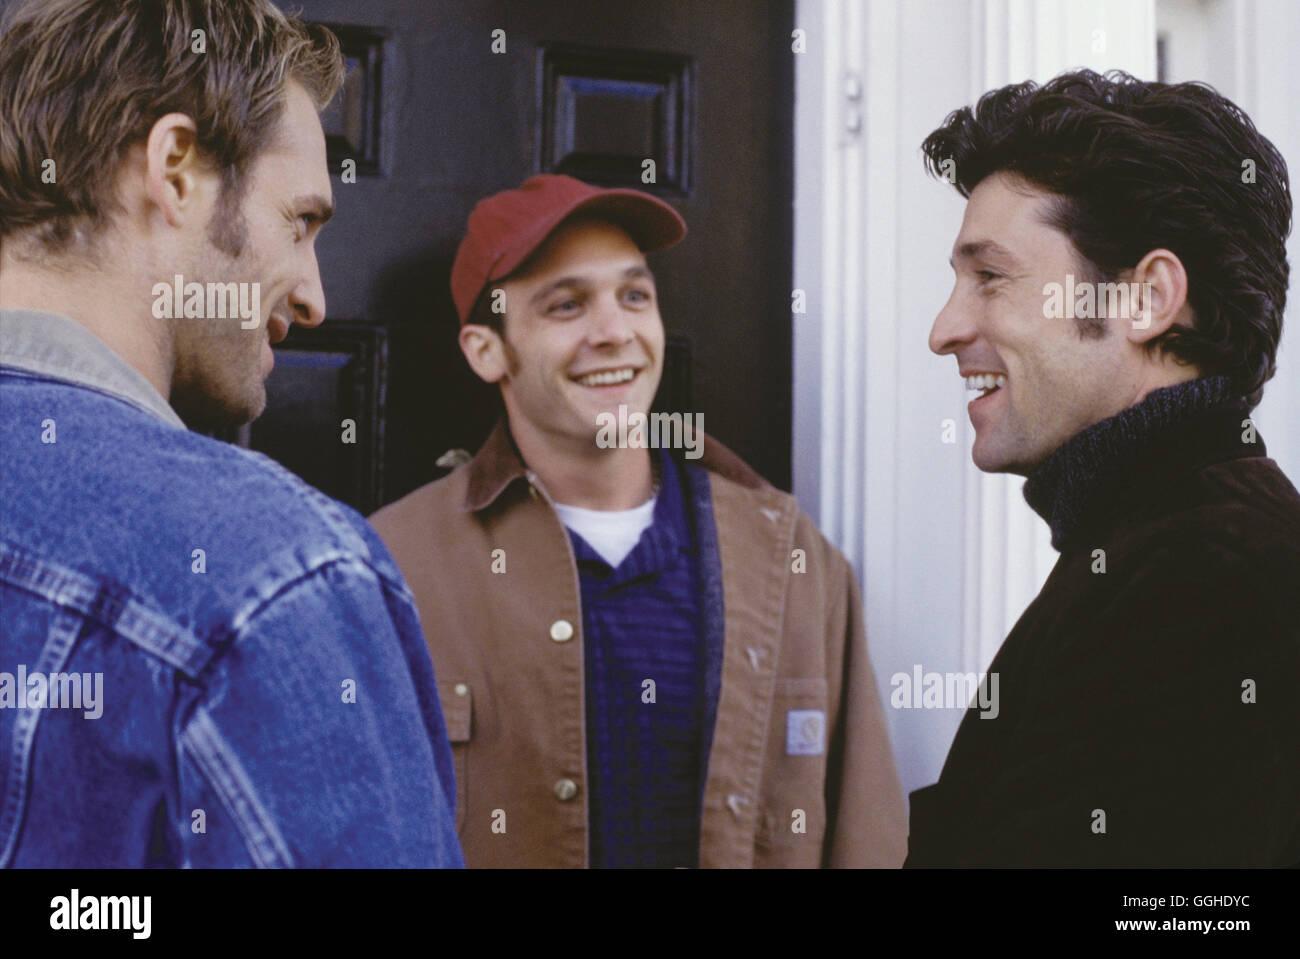 SWEET HOME ALABAMA - LIEBE AUF UMWEGEN / Sweet Home Alabama USA 2002 / Andy Tennant Jake (JOSH LUCAS), sein Freund - Stock Image